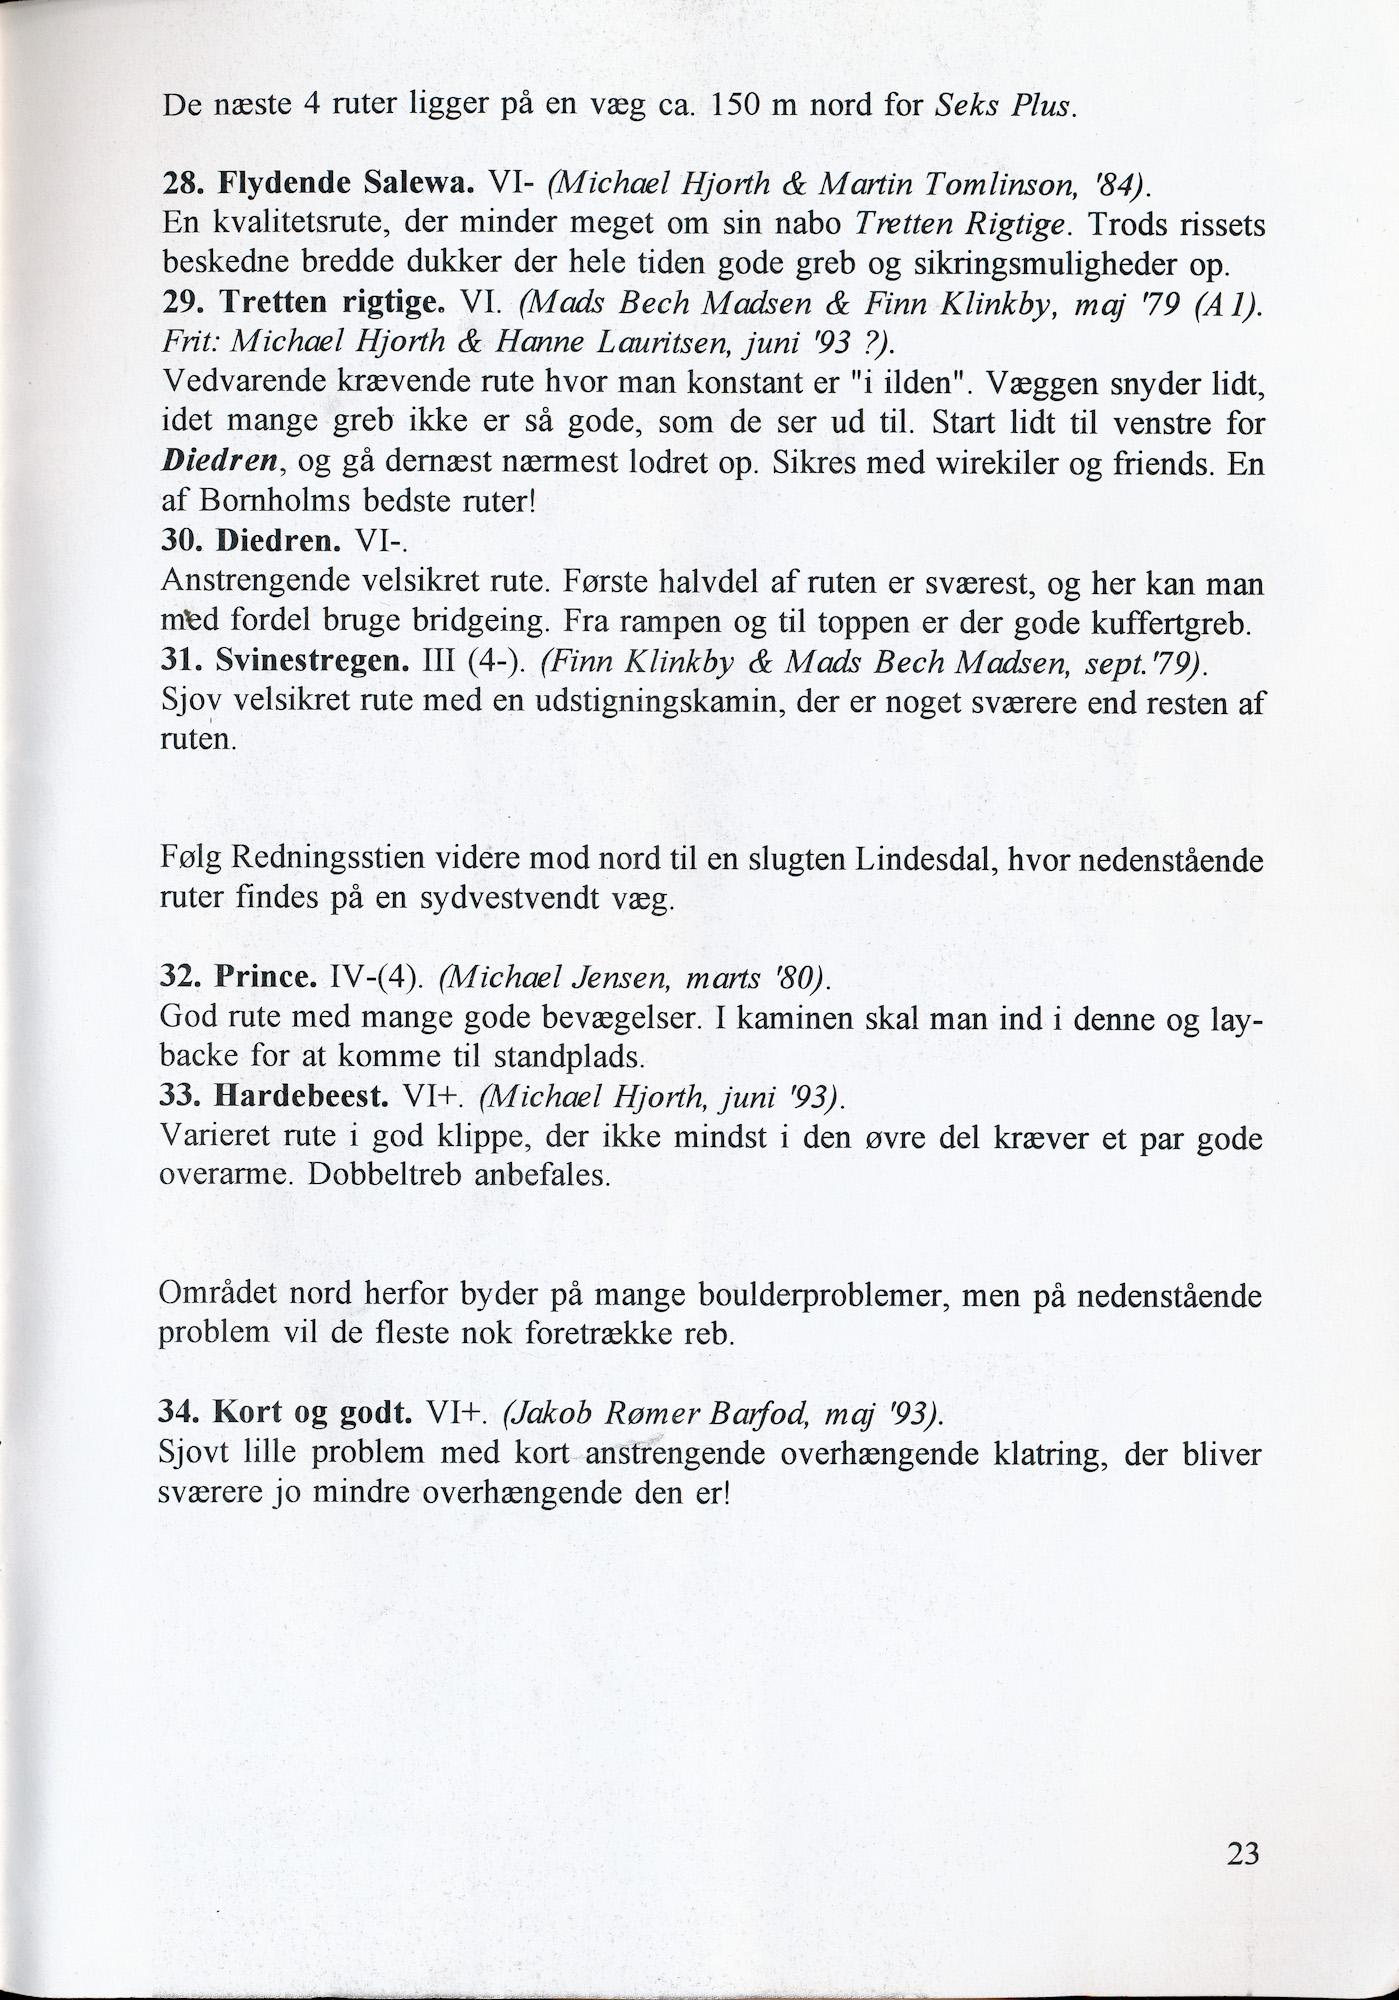 50 udvalgte ruter paa bornholm 1995 23.jpg